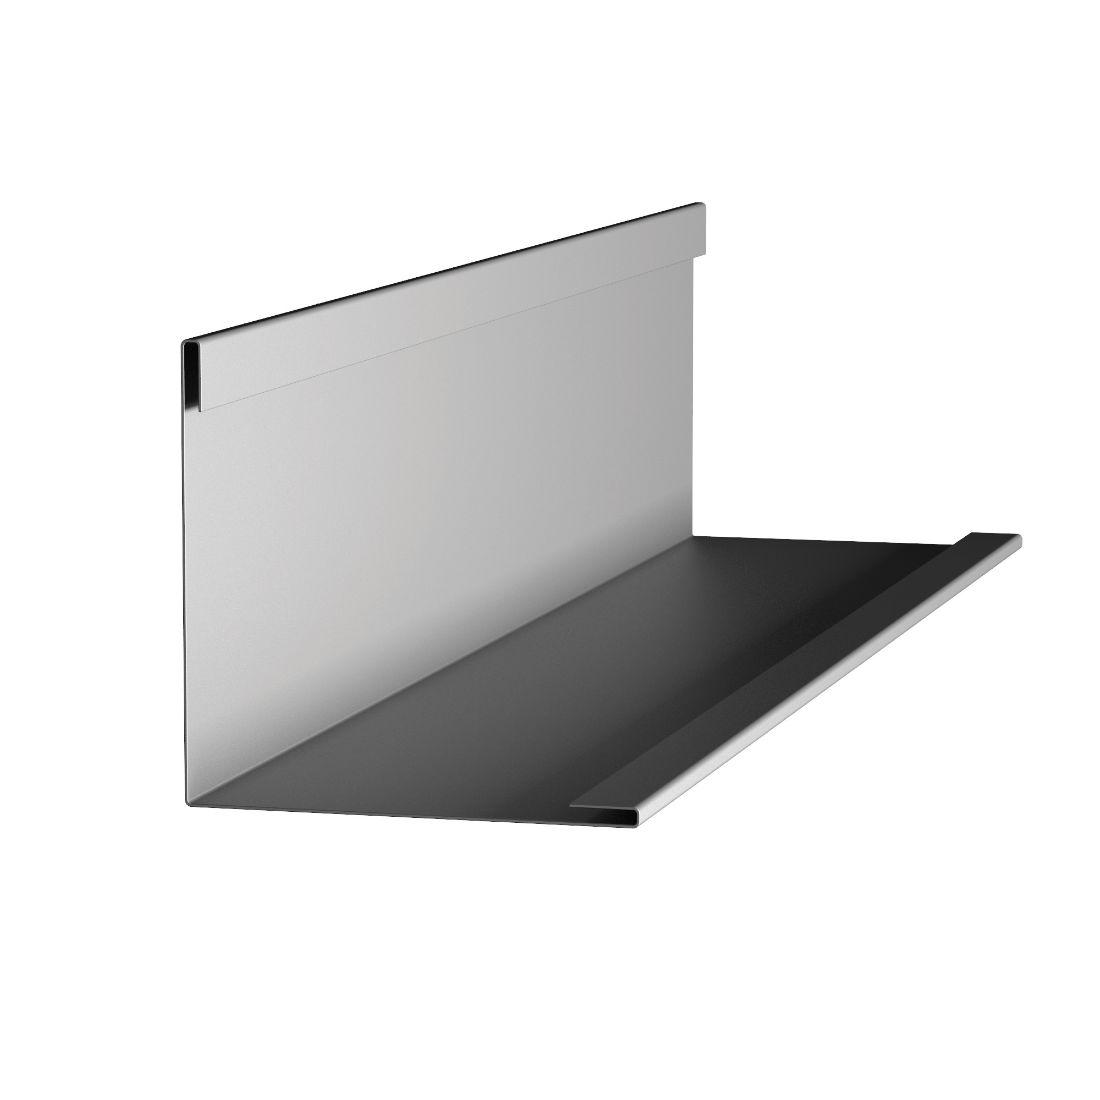 Shadowclad Internal 90 Angle Stainless Steel Flashing 3.0m